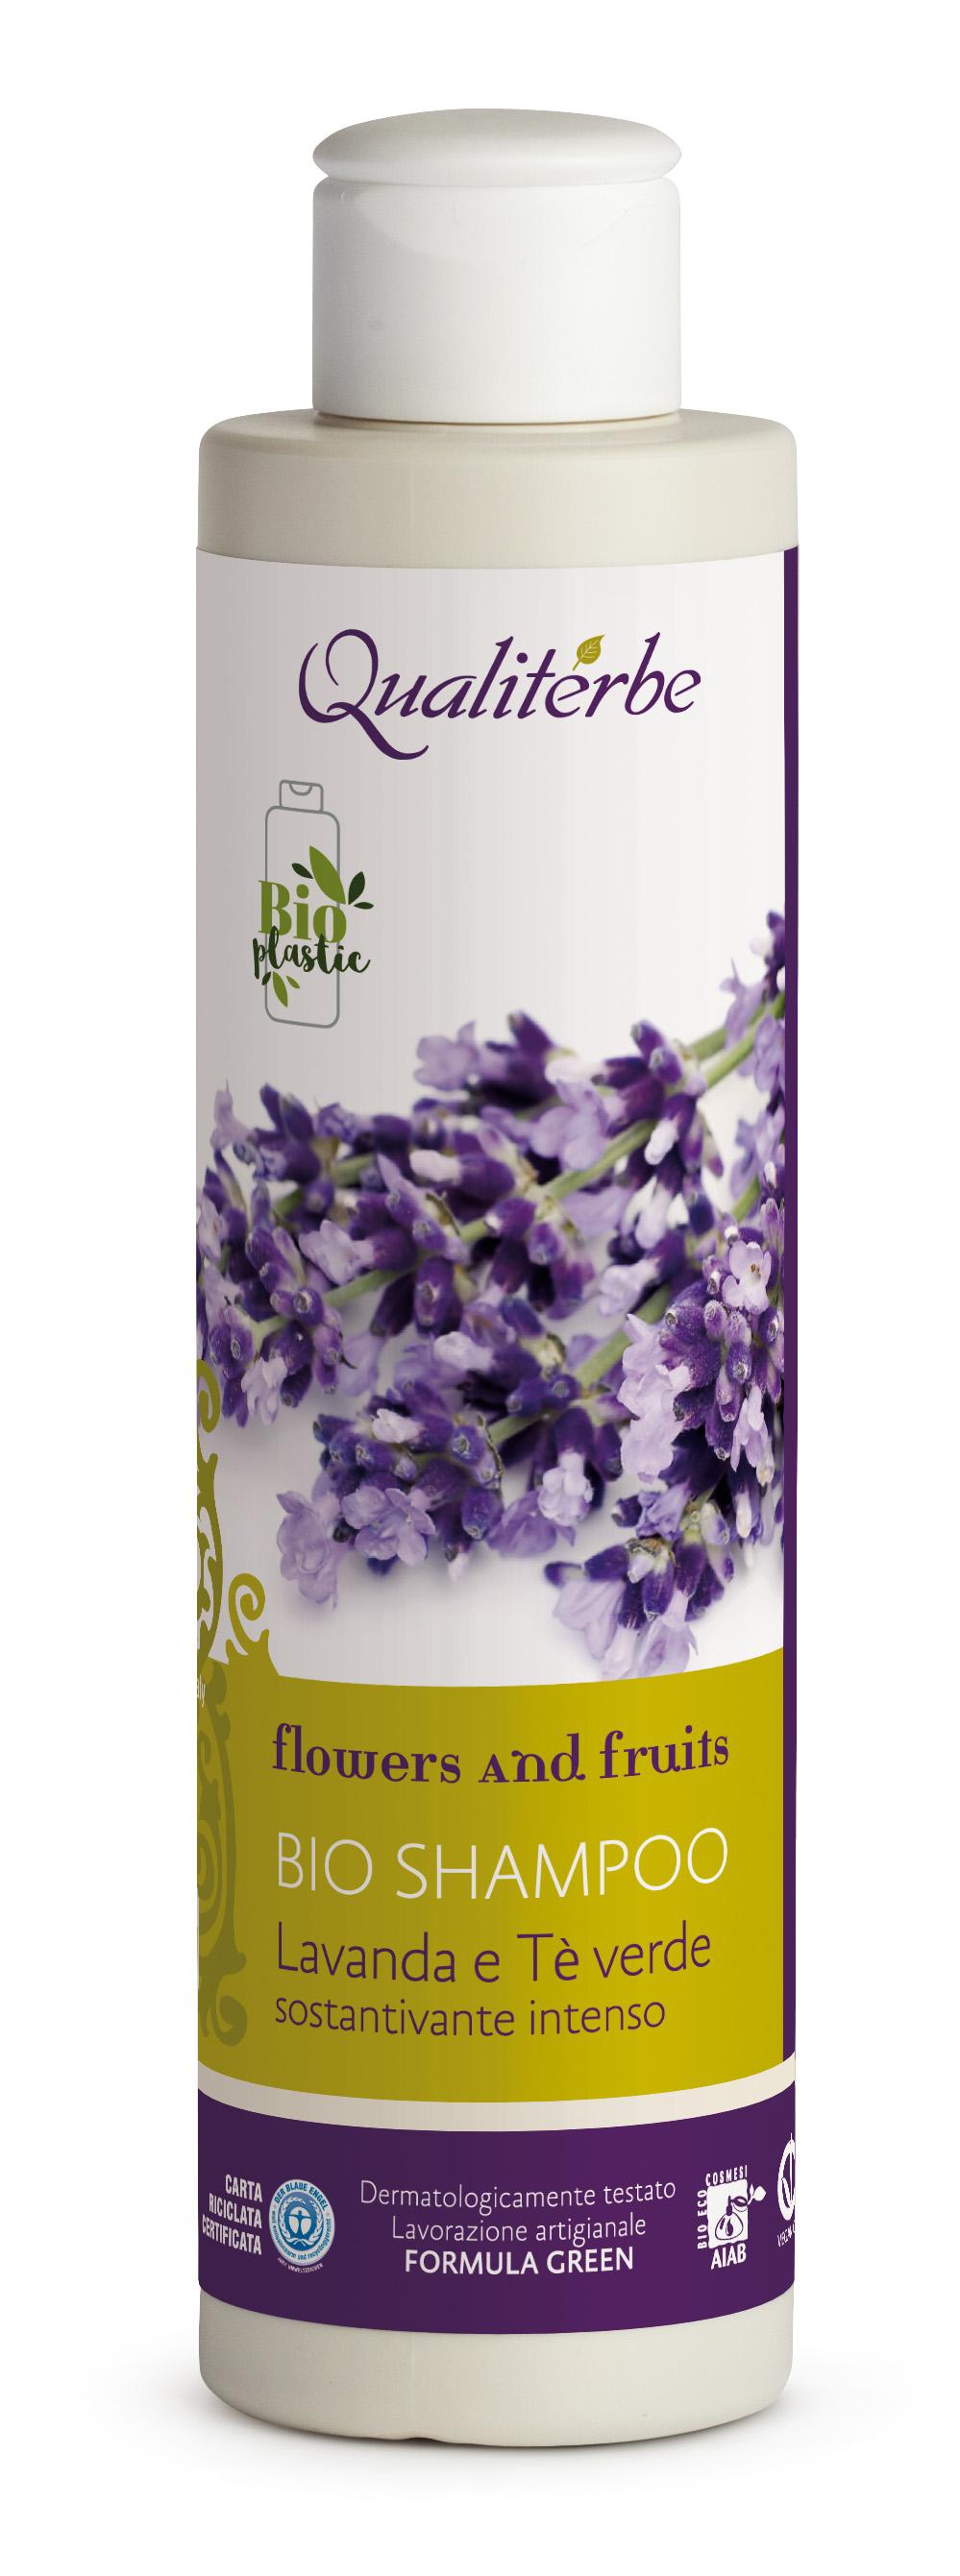 Shampoo sostantivante intenso Lavanda e Tè verde100% Naturale by Qualiterbe